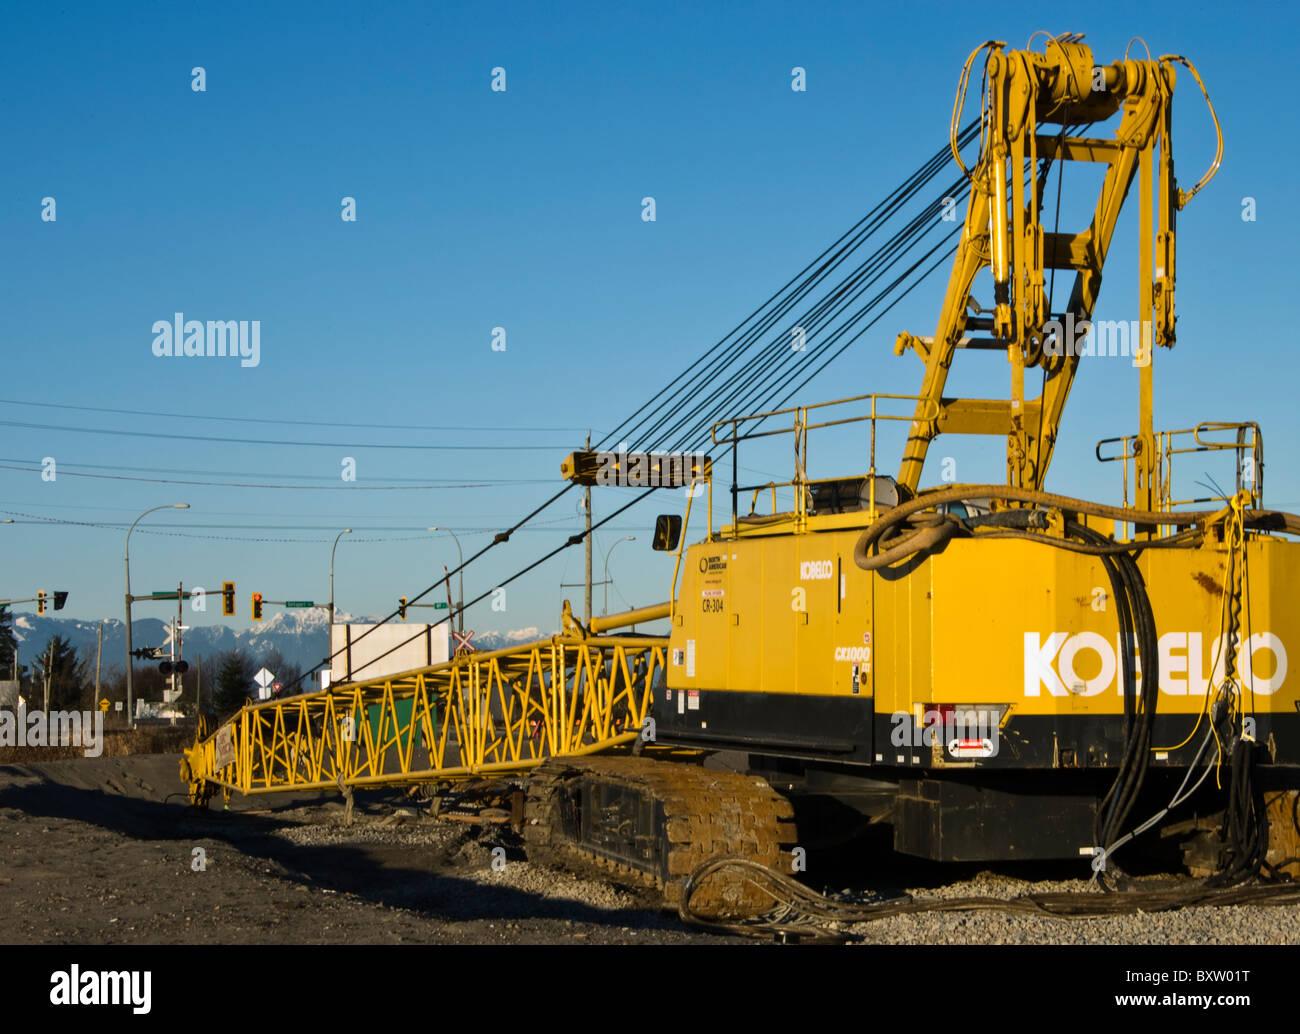 crawler crane with boom lowered - Stock Image